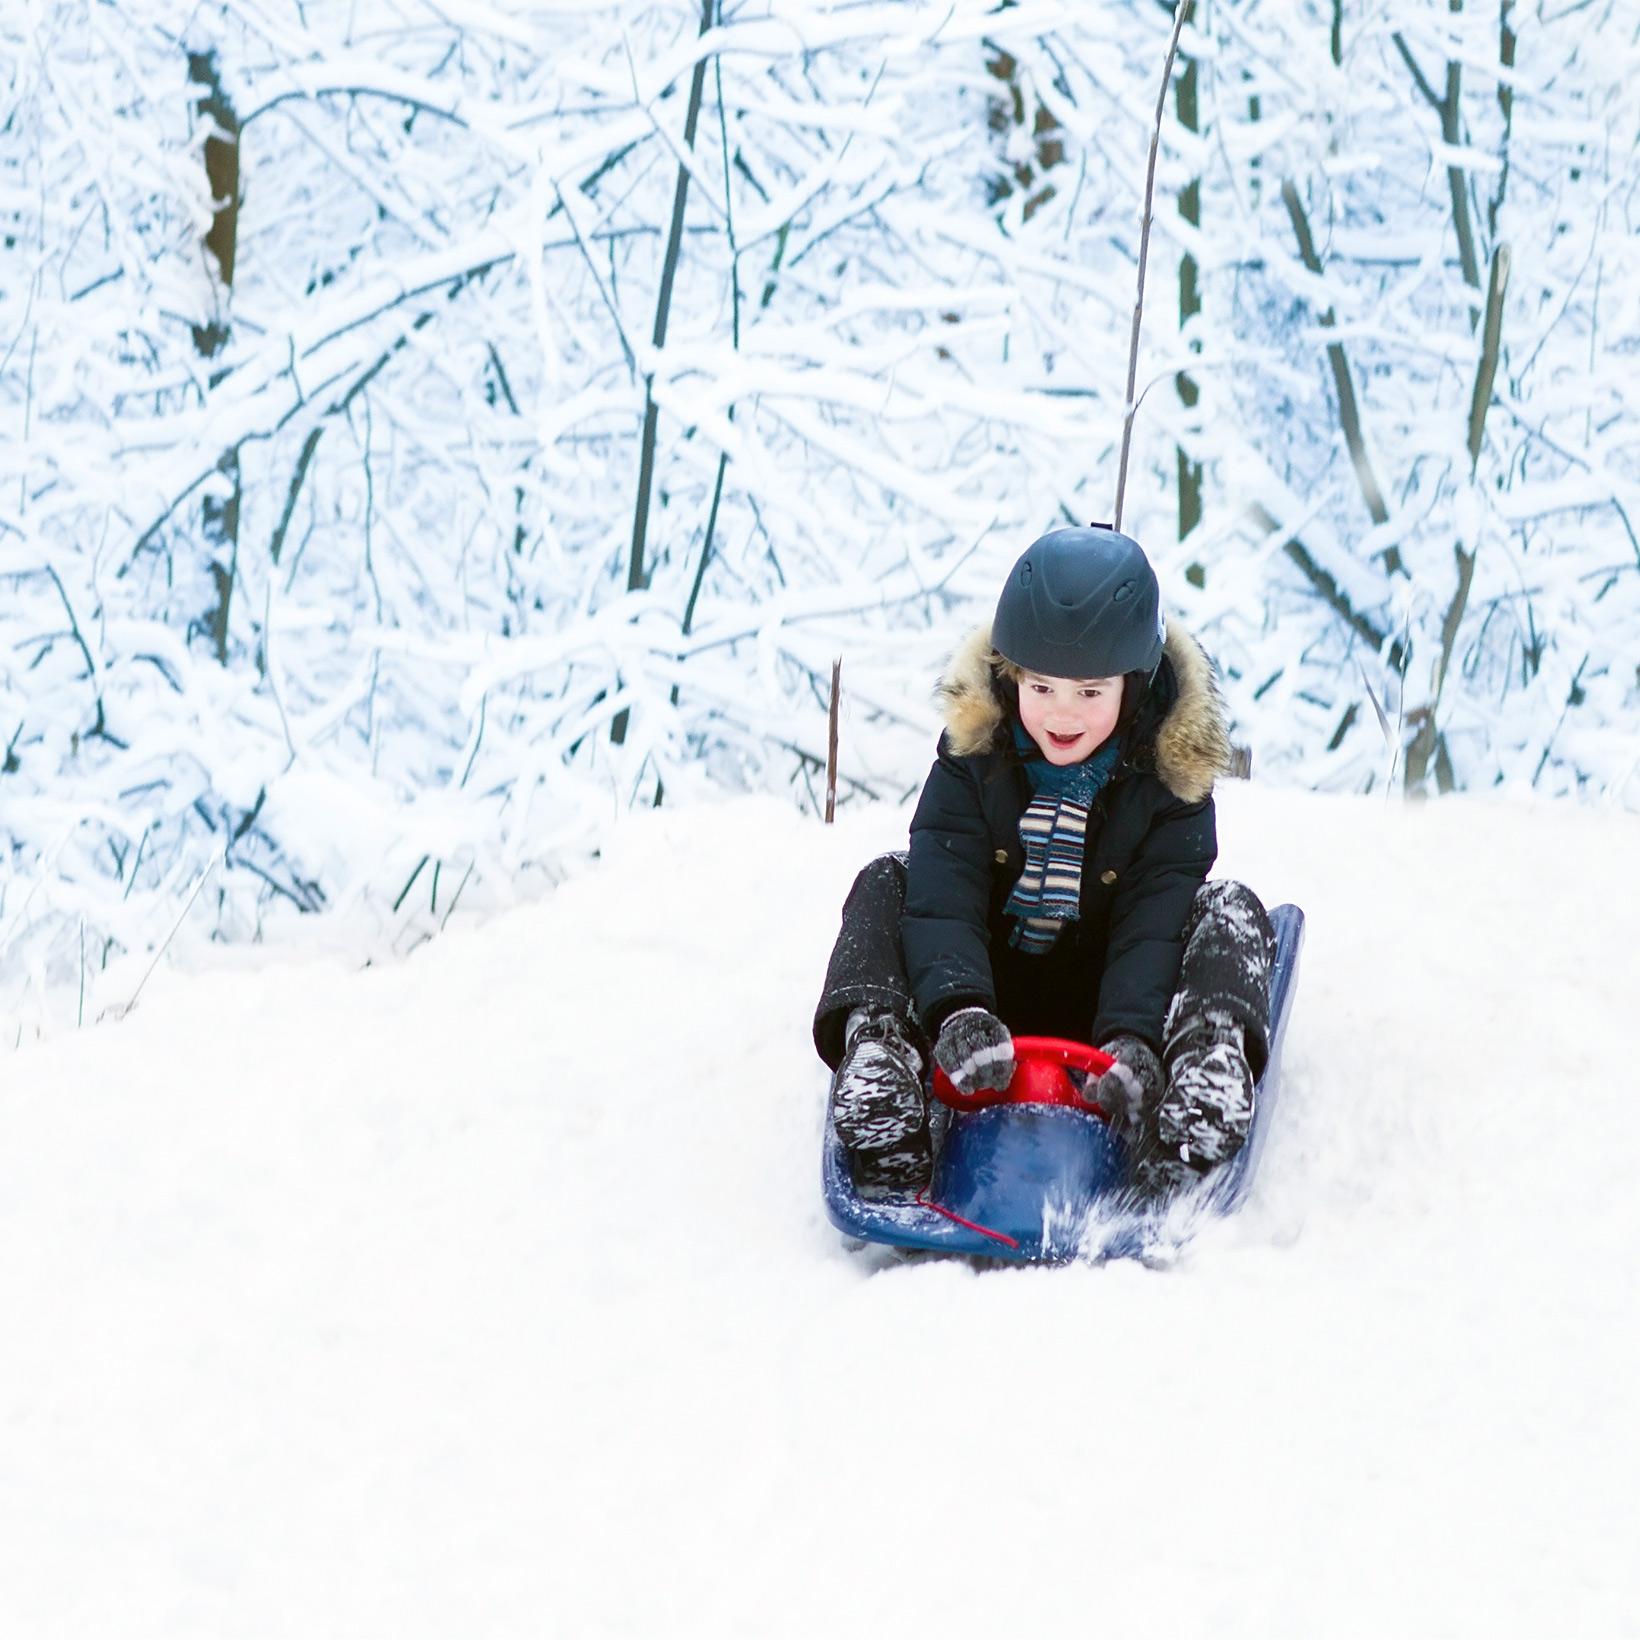 how to keep sledding safe